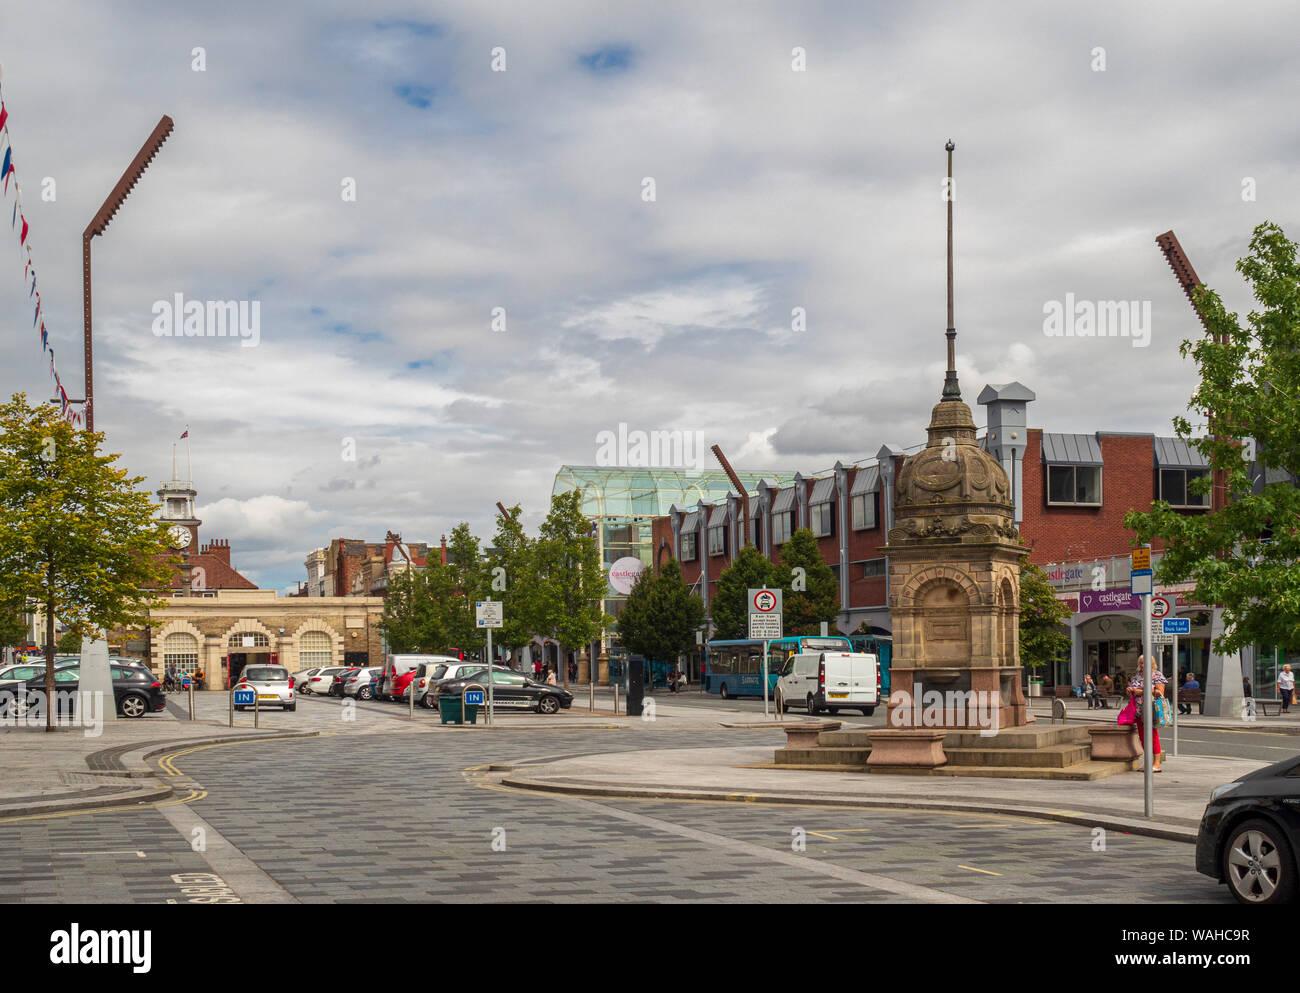 Dodshon's Fountain and Shambles Market Hall, High Street, Stockton-on-Tees, County Durham, UK. Stock Photo